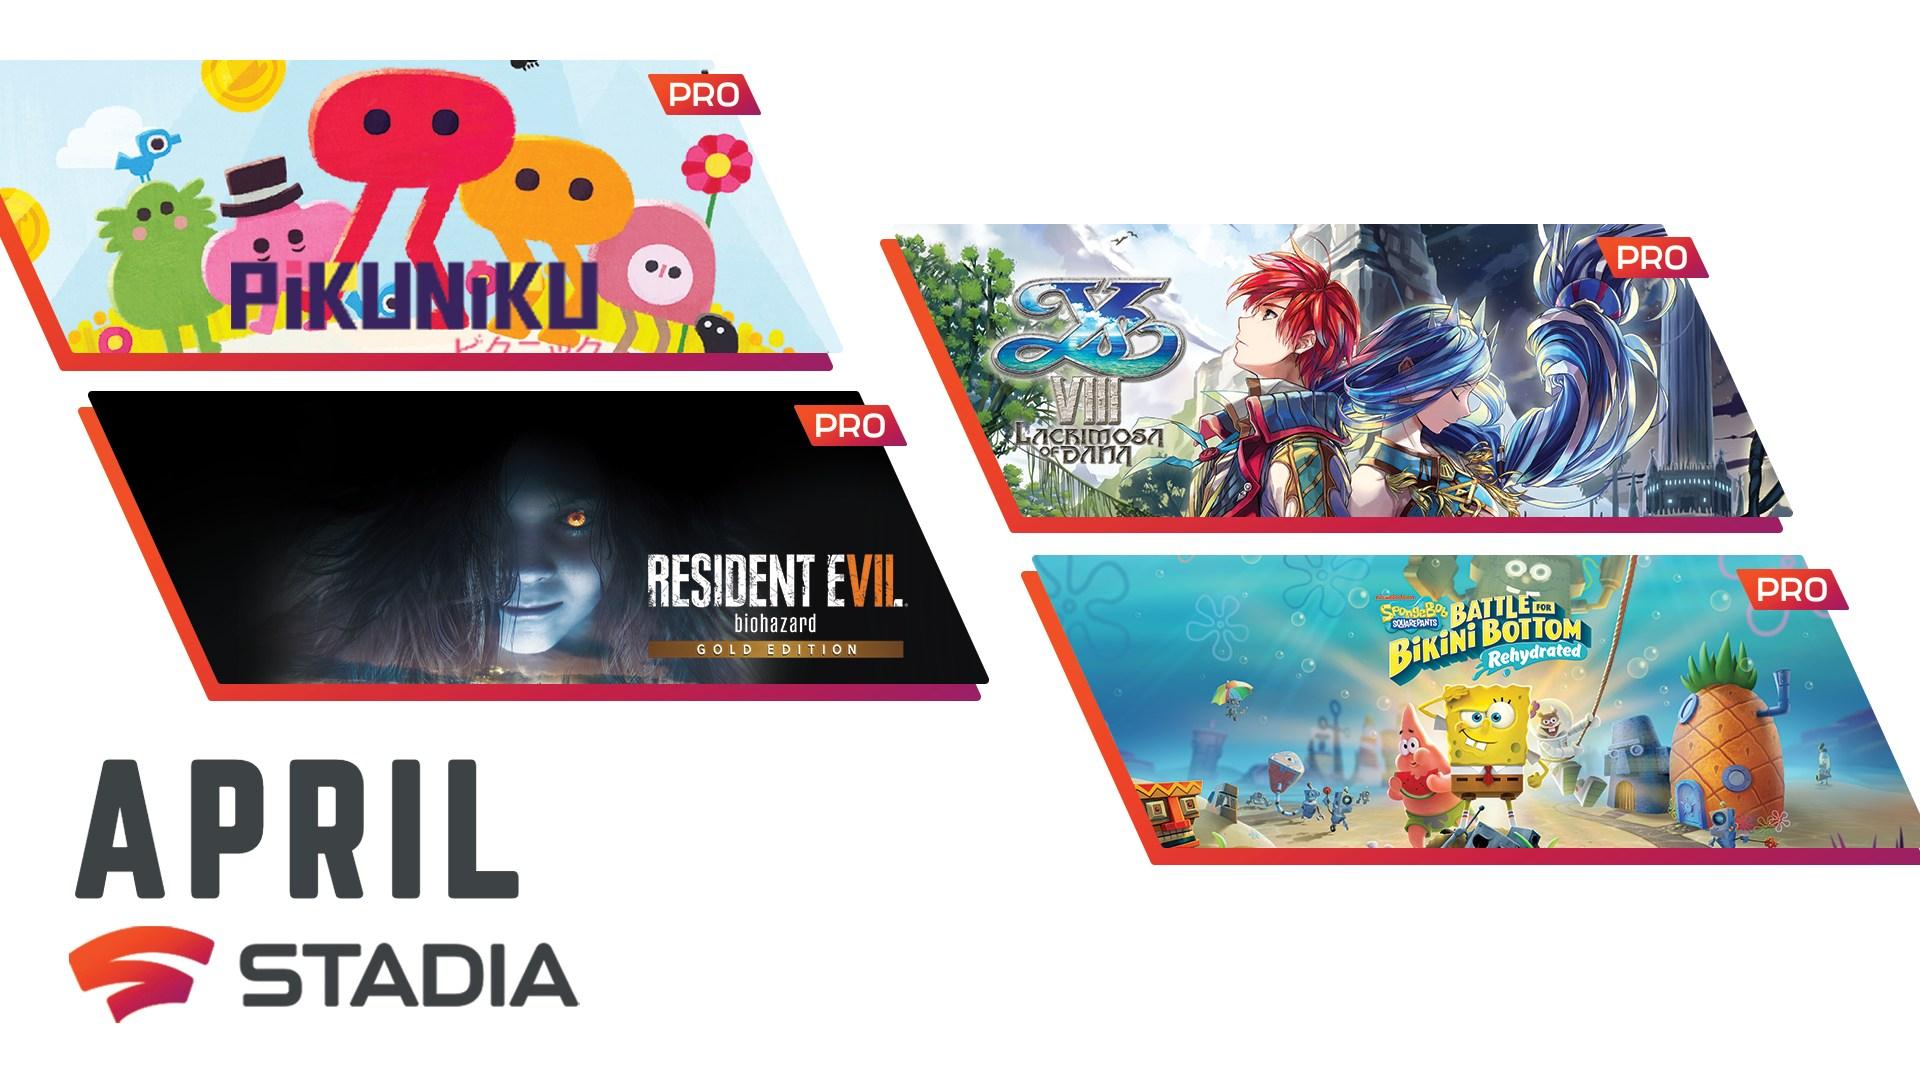 [Stadia Pro] April free Games: u.a. Resident Evil 7 biohazard Gold Edition und SpongeBob SquarePants